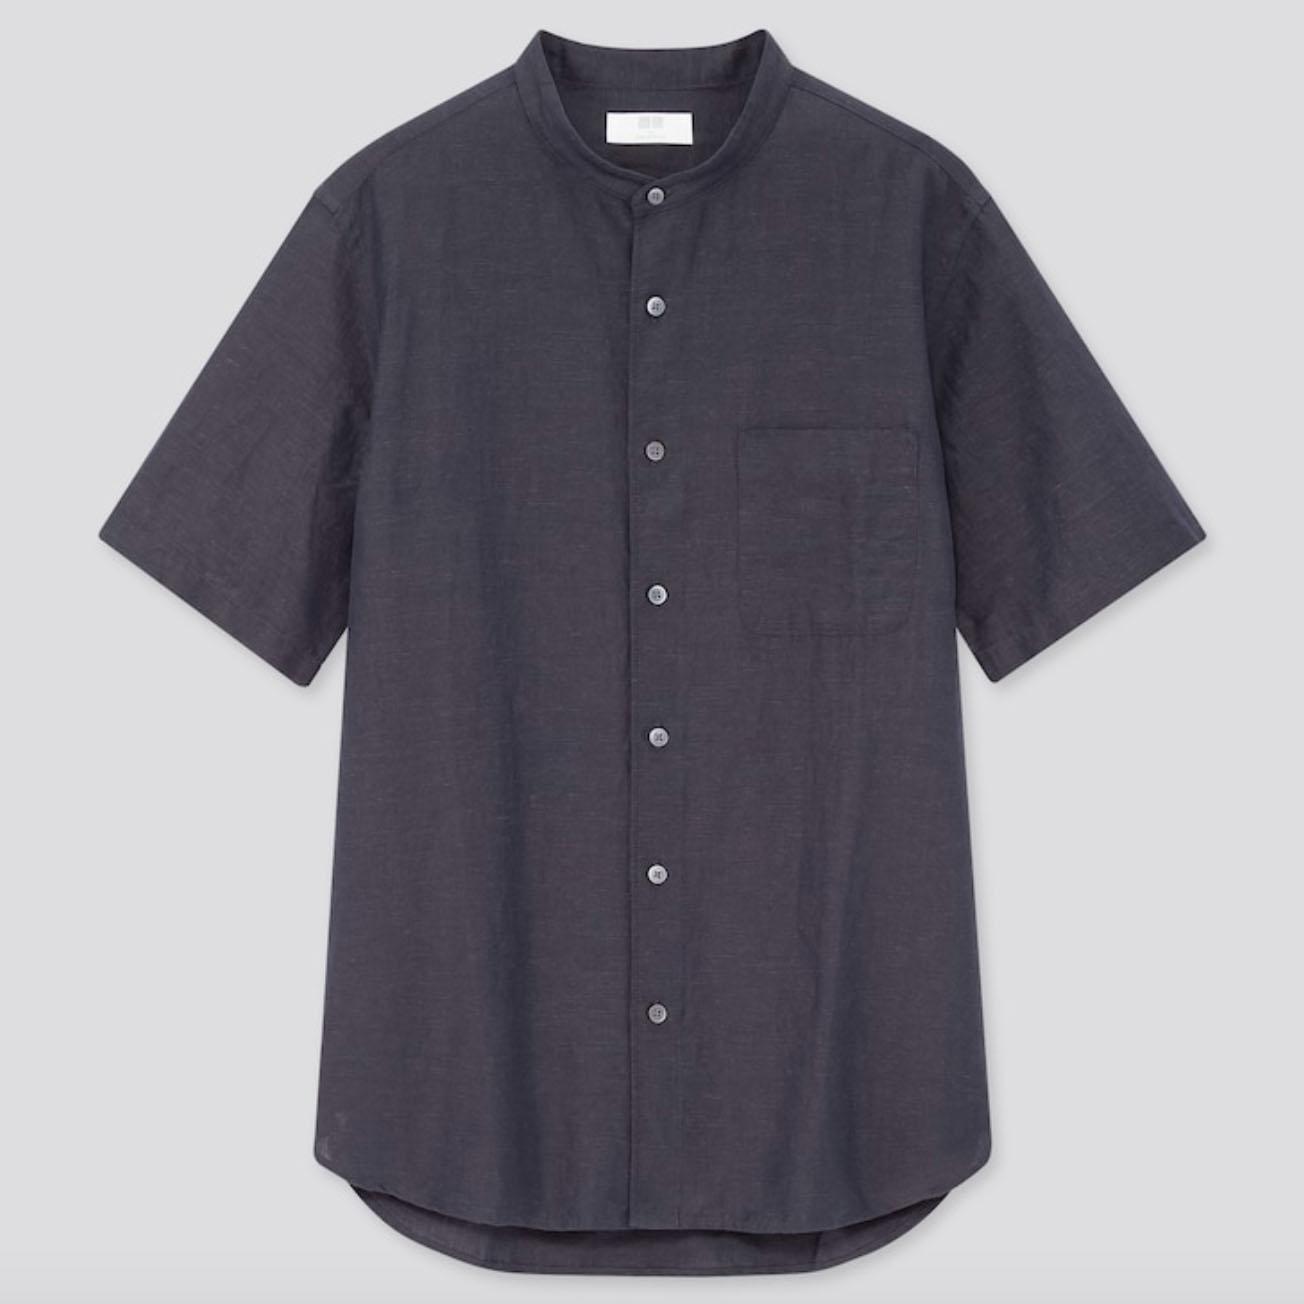 Uniqlo Men Linen Cotton Short-Sleeve Shirt